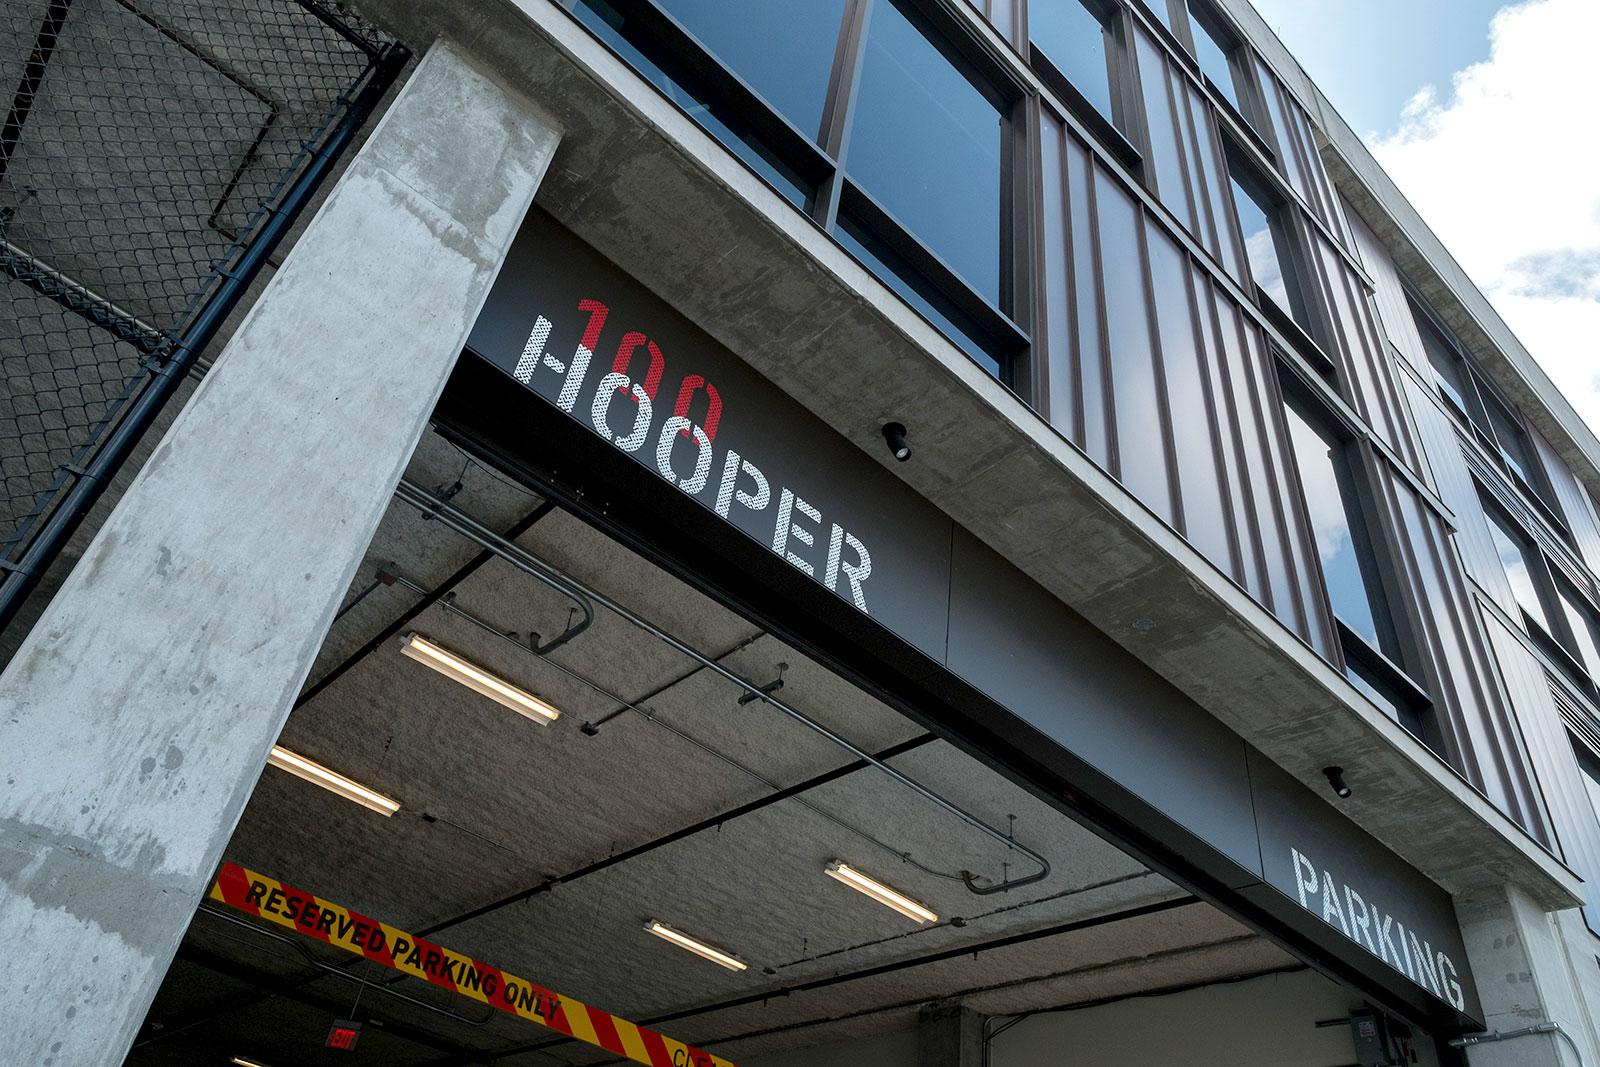 1600_100-hooper-signage20190829-61